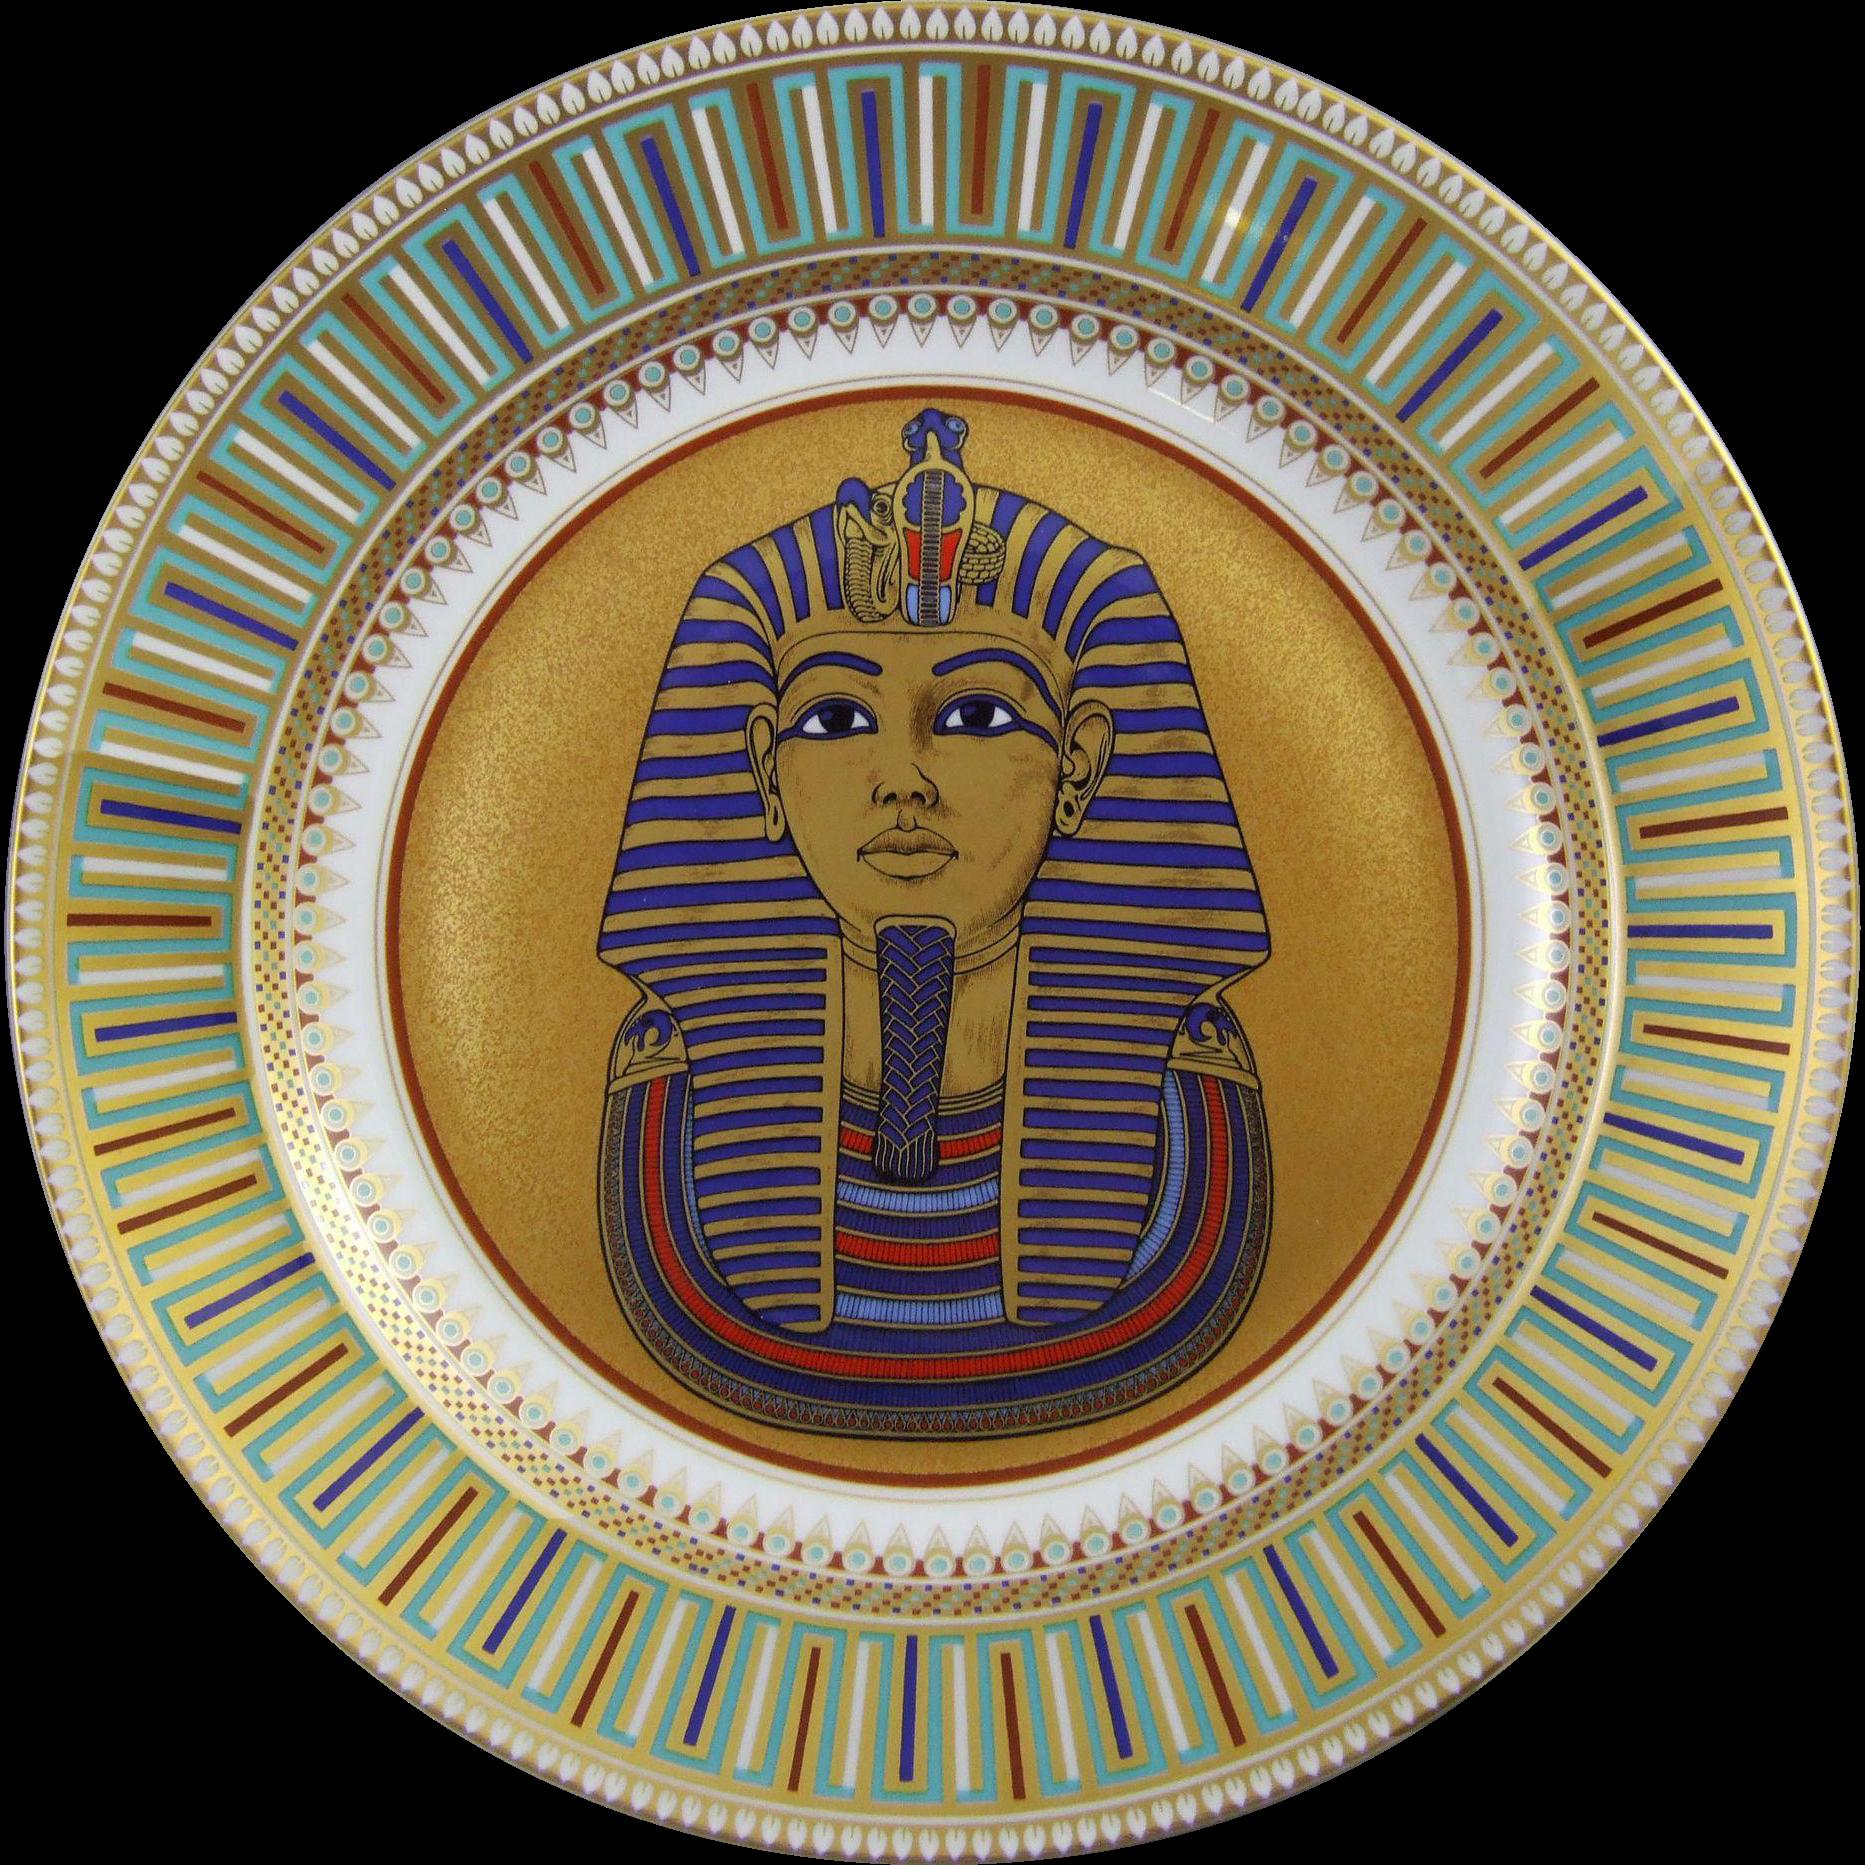 Kaiser Porcelain King Tut-Ankh-Amun Wall Charger